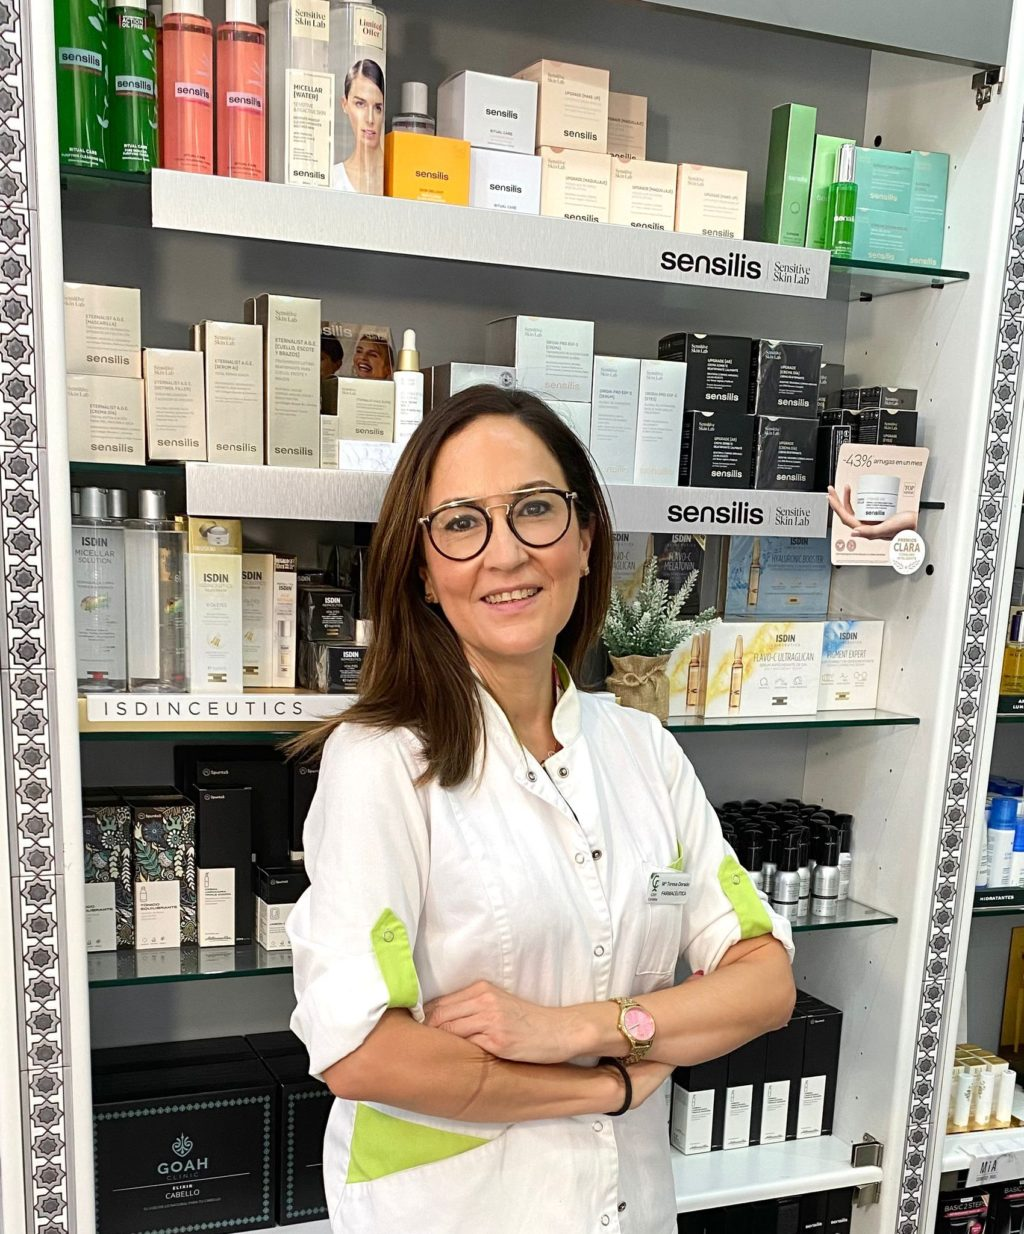 Foto de Foto de María Teresa Dorad, farmacéutica titular de